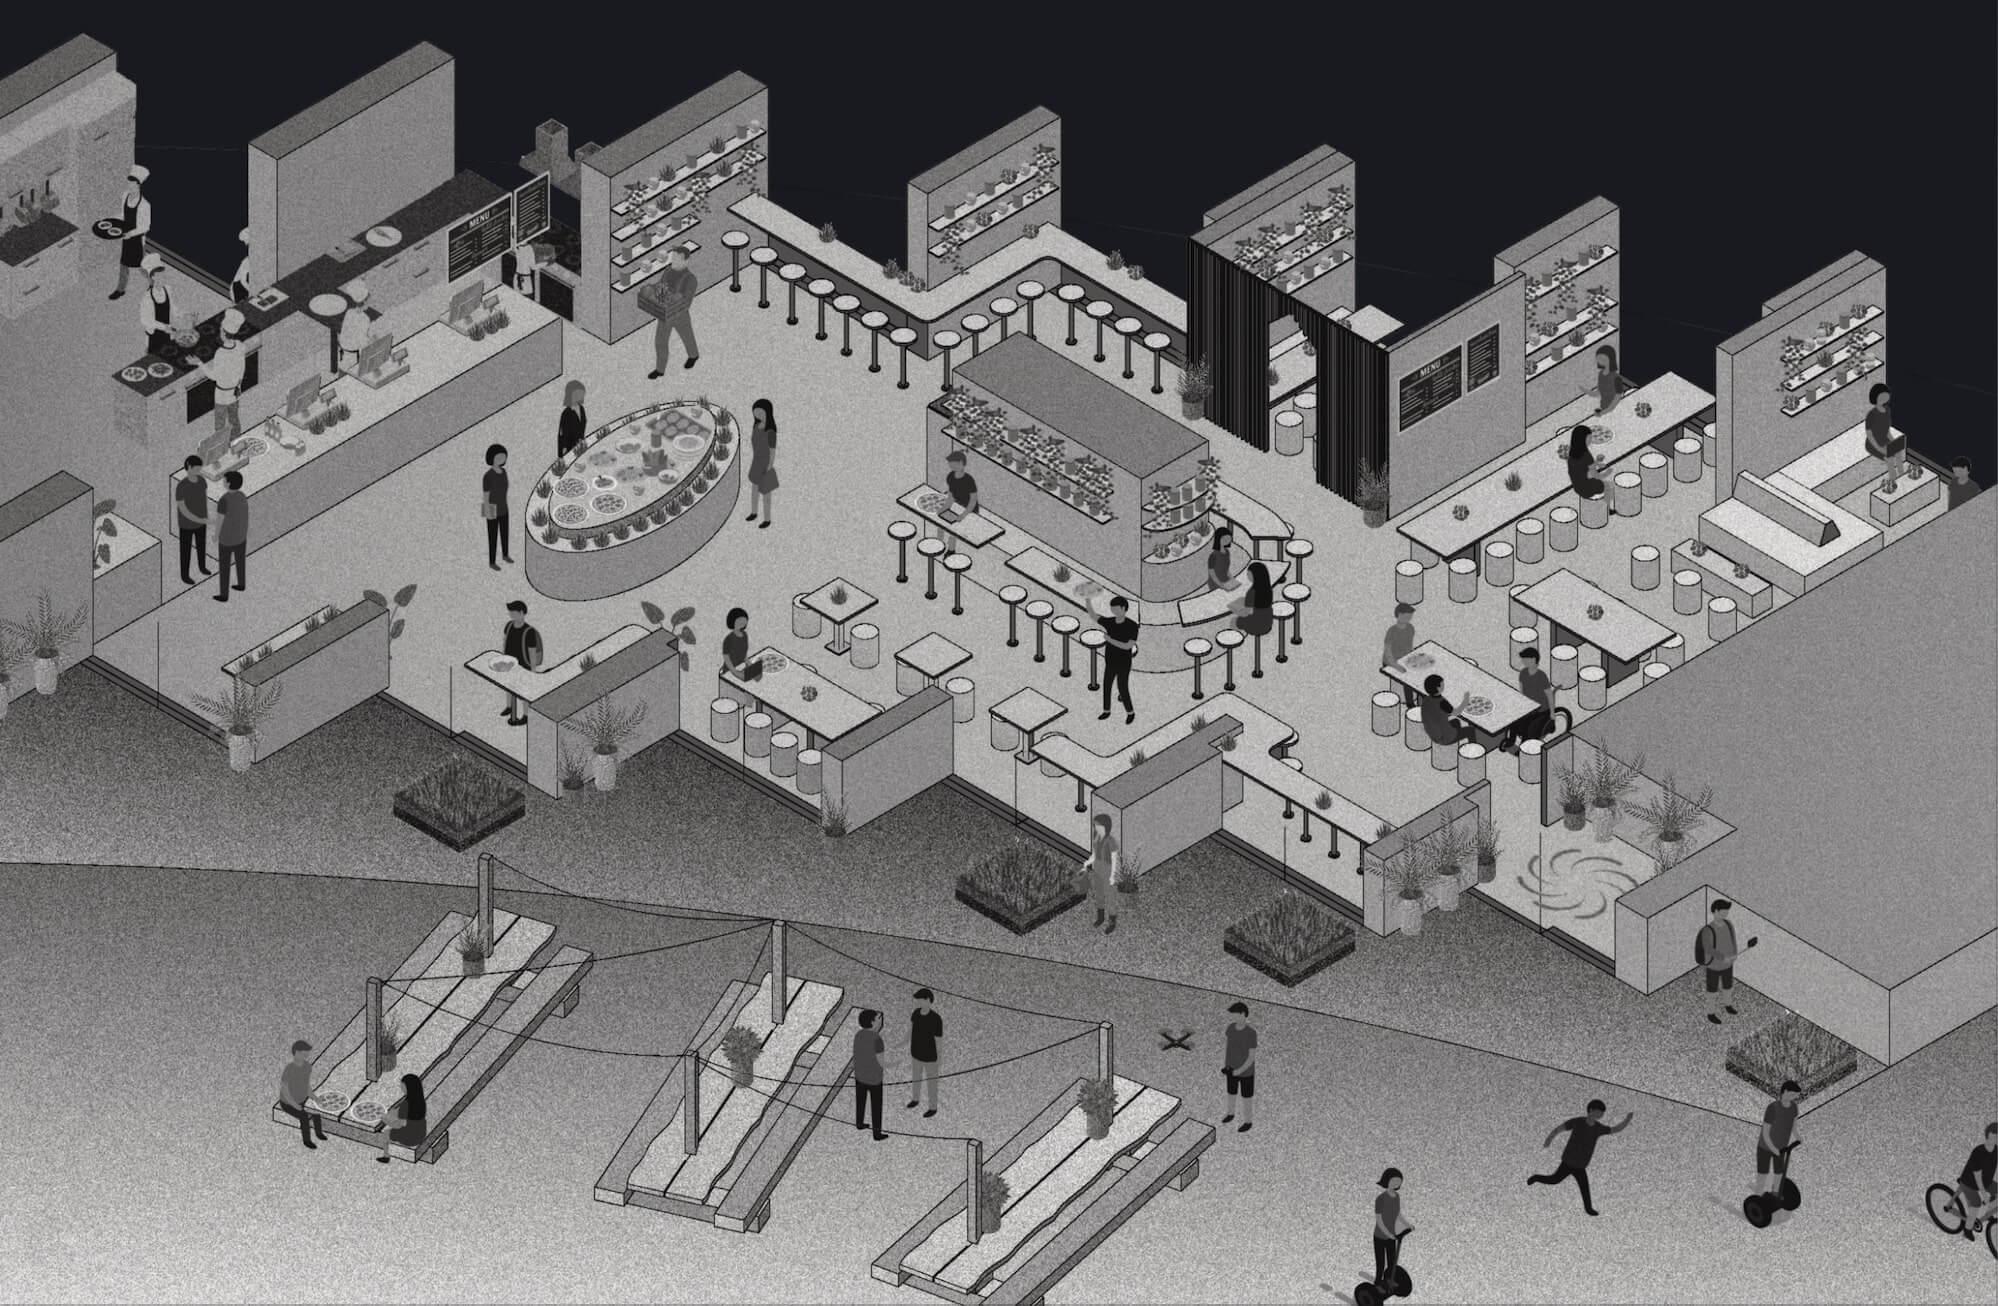 the architecture illustration of a restaurant explains the concept design